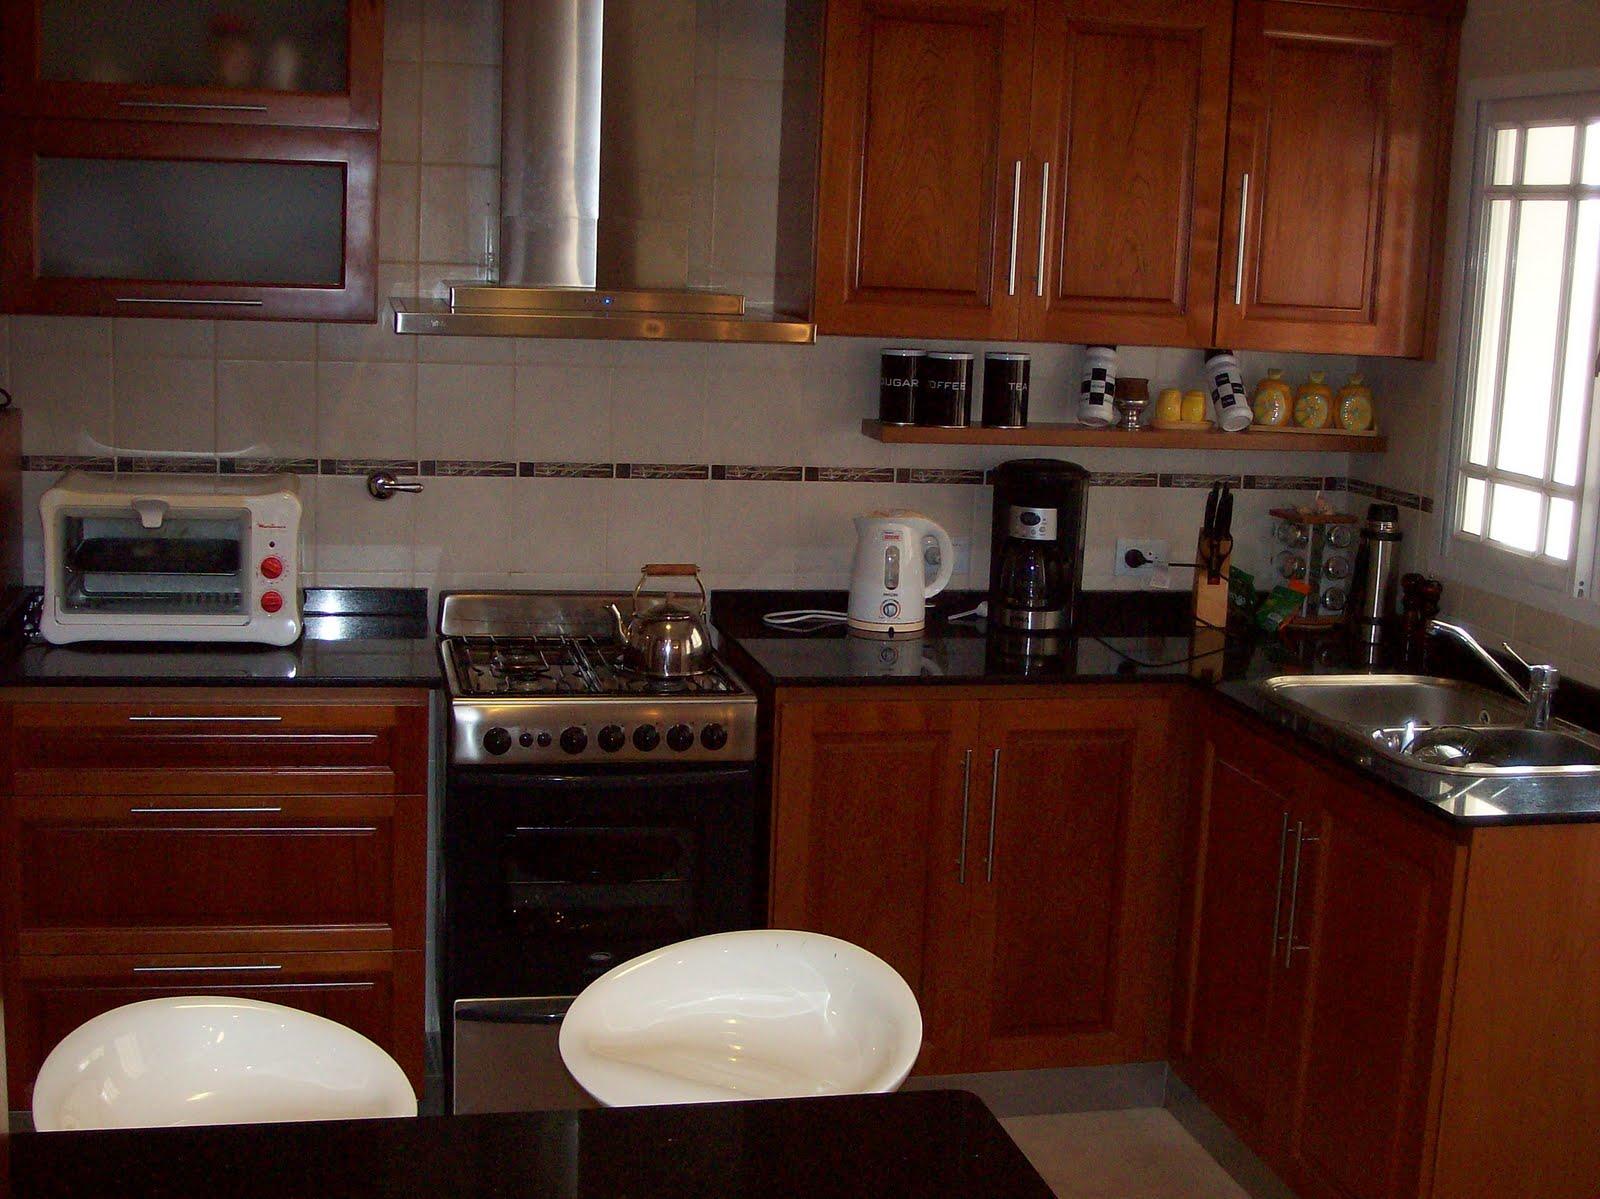 Perren amoblamientos diferentes modelos de cocinas for Modelos de cocina comedor pequenos